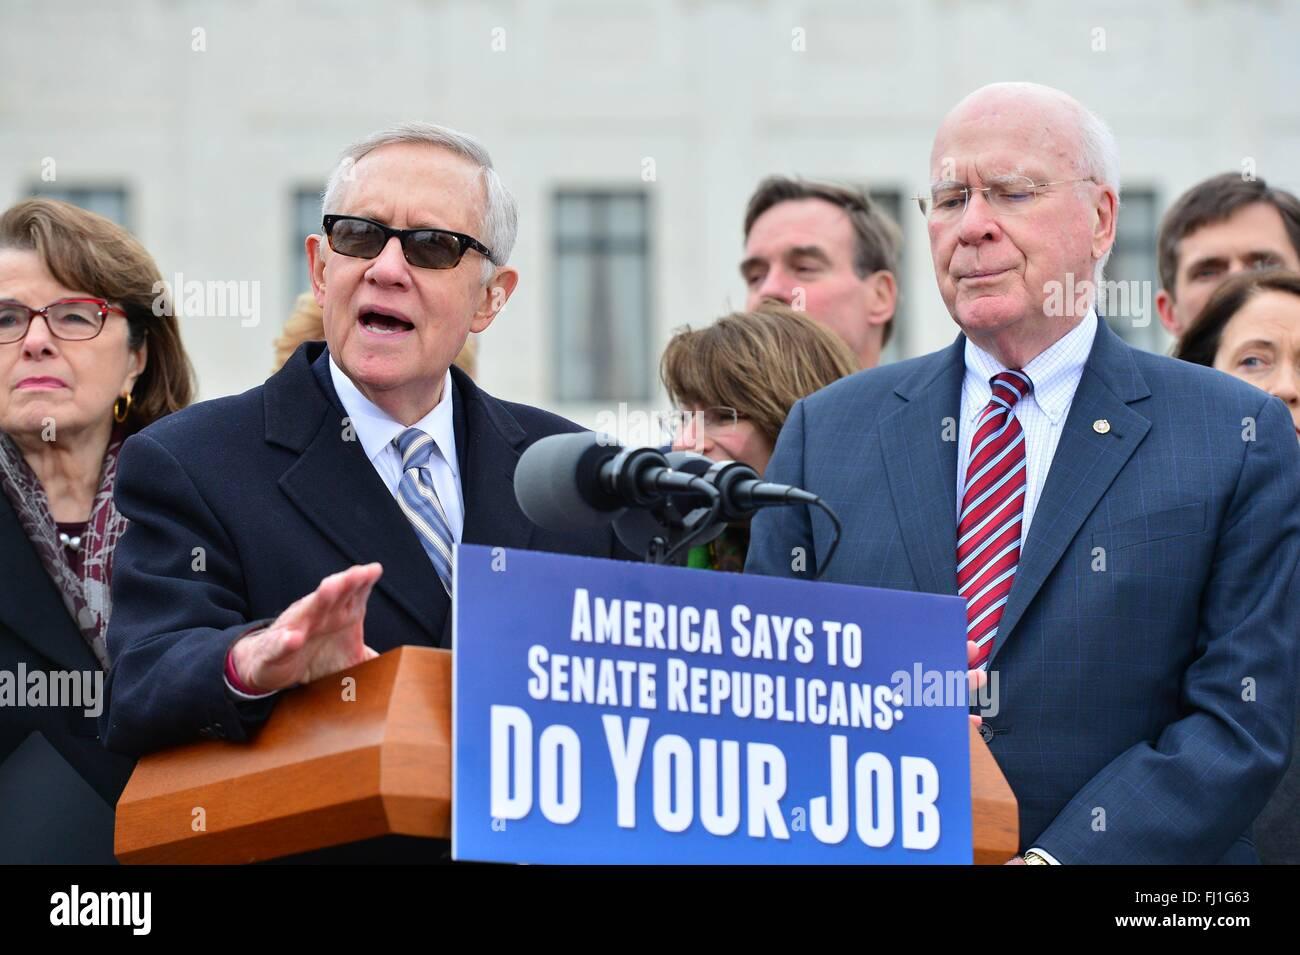 U.S. Senator Minority leader Harry Reid joined by Sen. Patrick Leahy, the ranking member of the Senate Judiciary - Stock Image